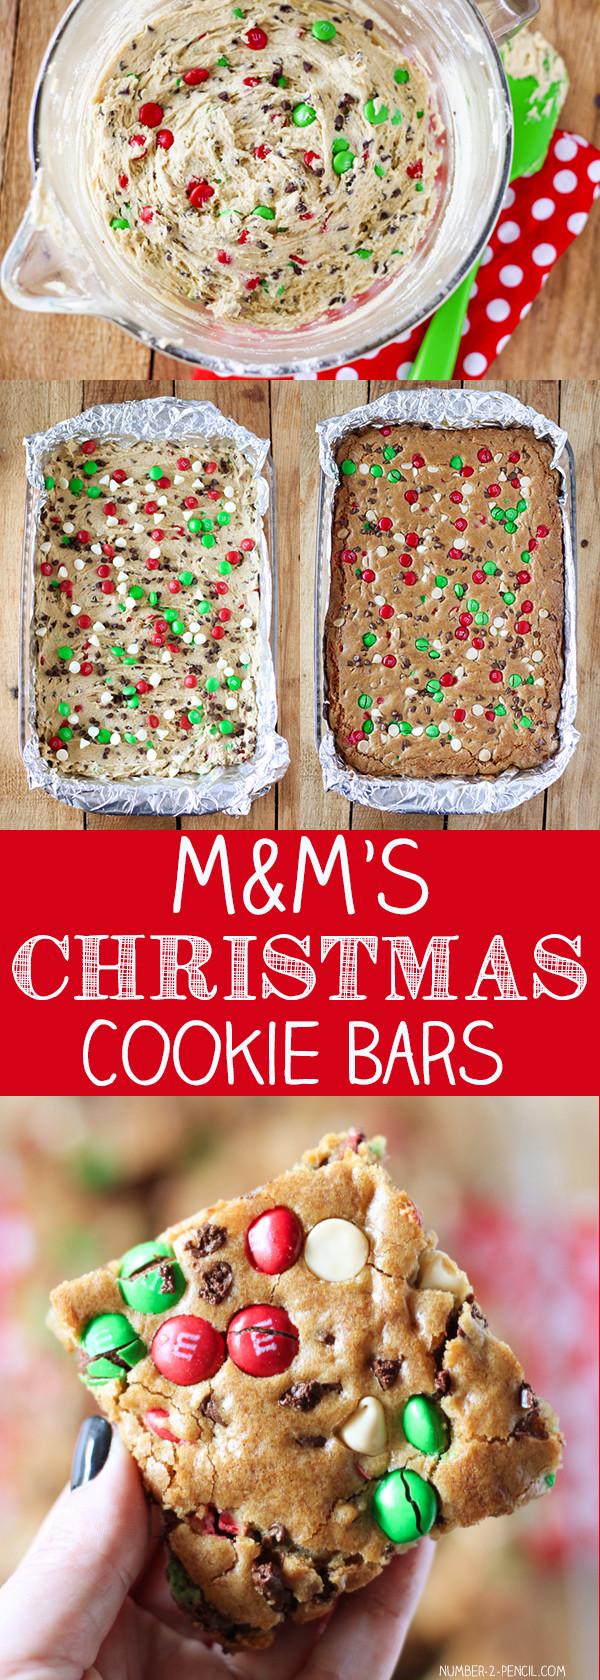 Christmas Cookies And Bars  M&M S Christmas Cookie Bars No 2 Pencil